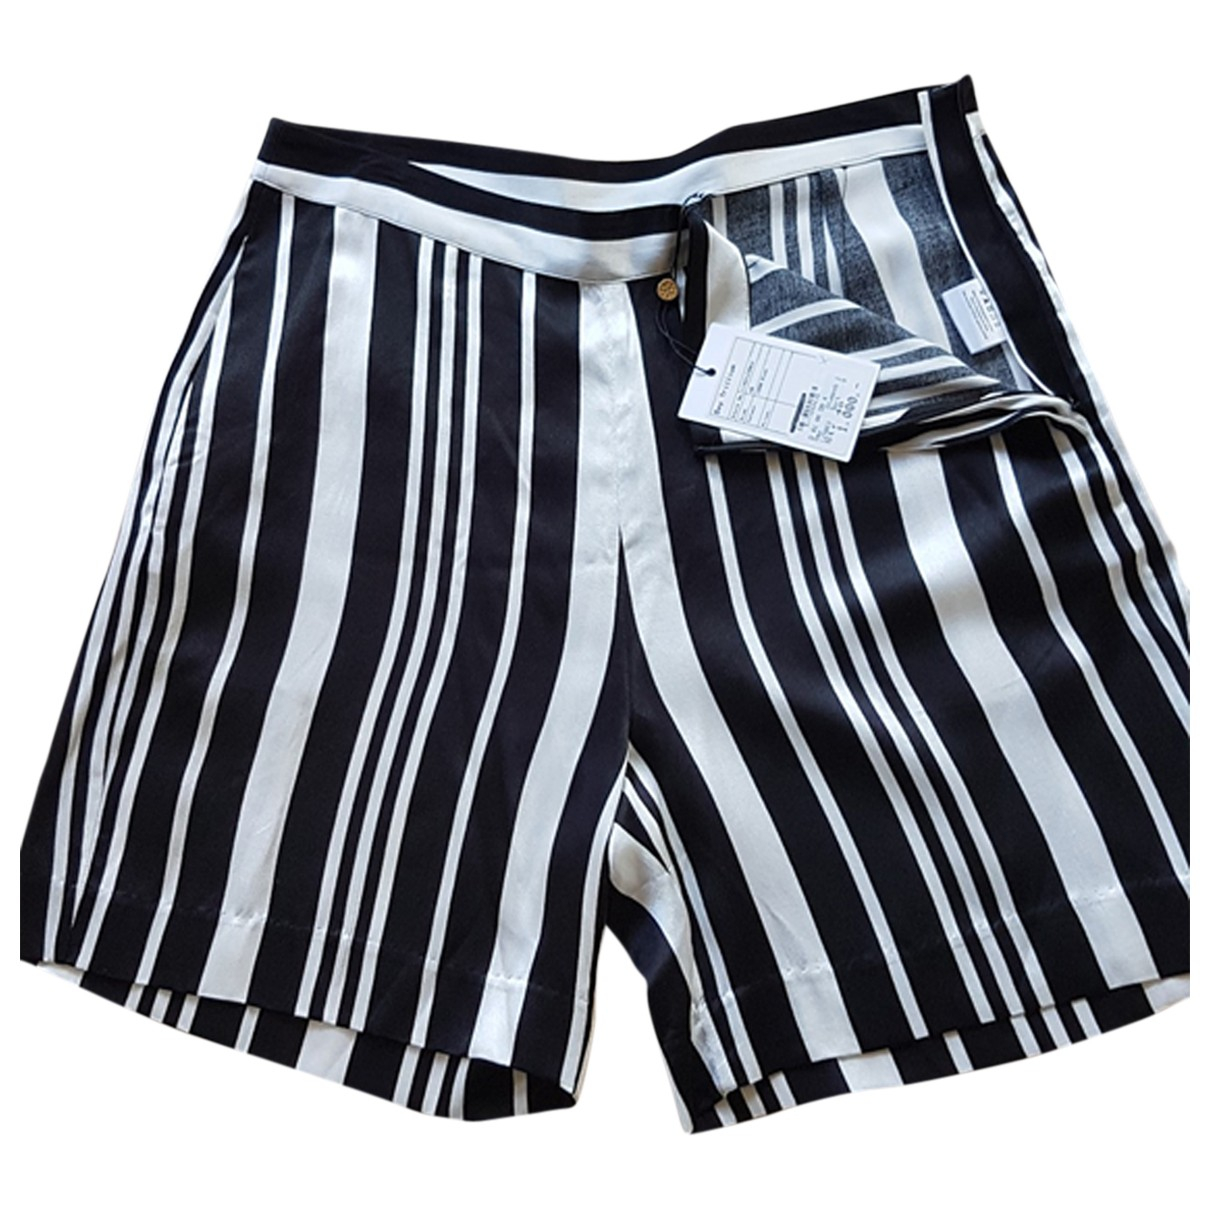 Day Birger & Mikkelsen \N Shorts in  Schwarz Polyester